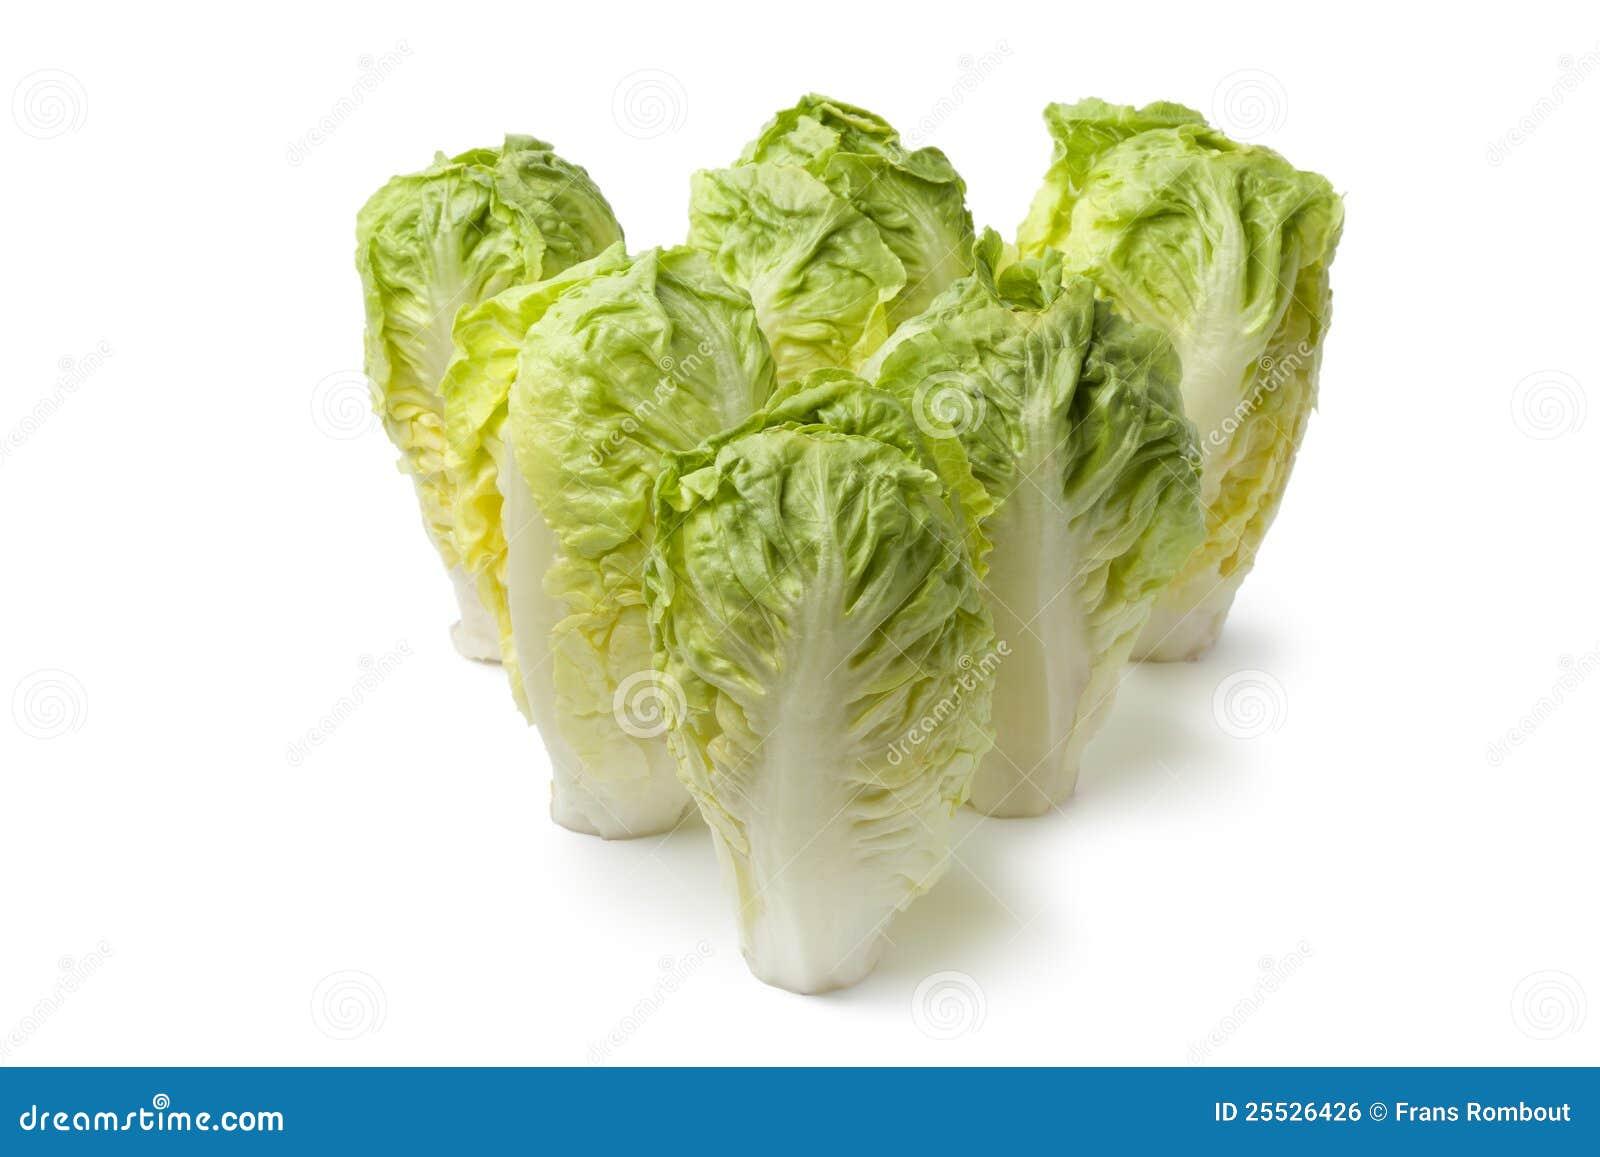 Baby Gem Lettuce Royalty Free Stock Image - Image: 25526426